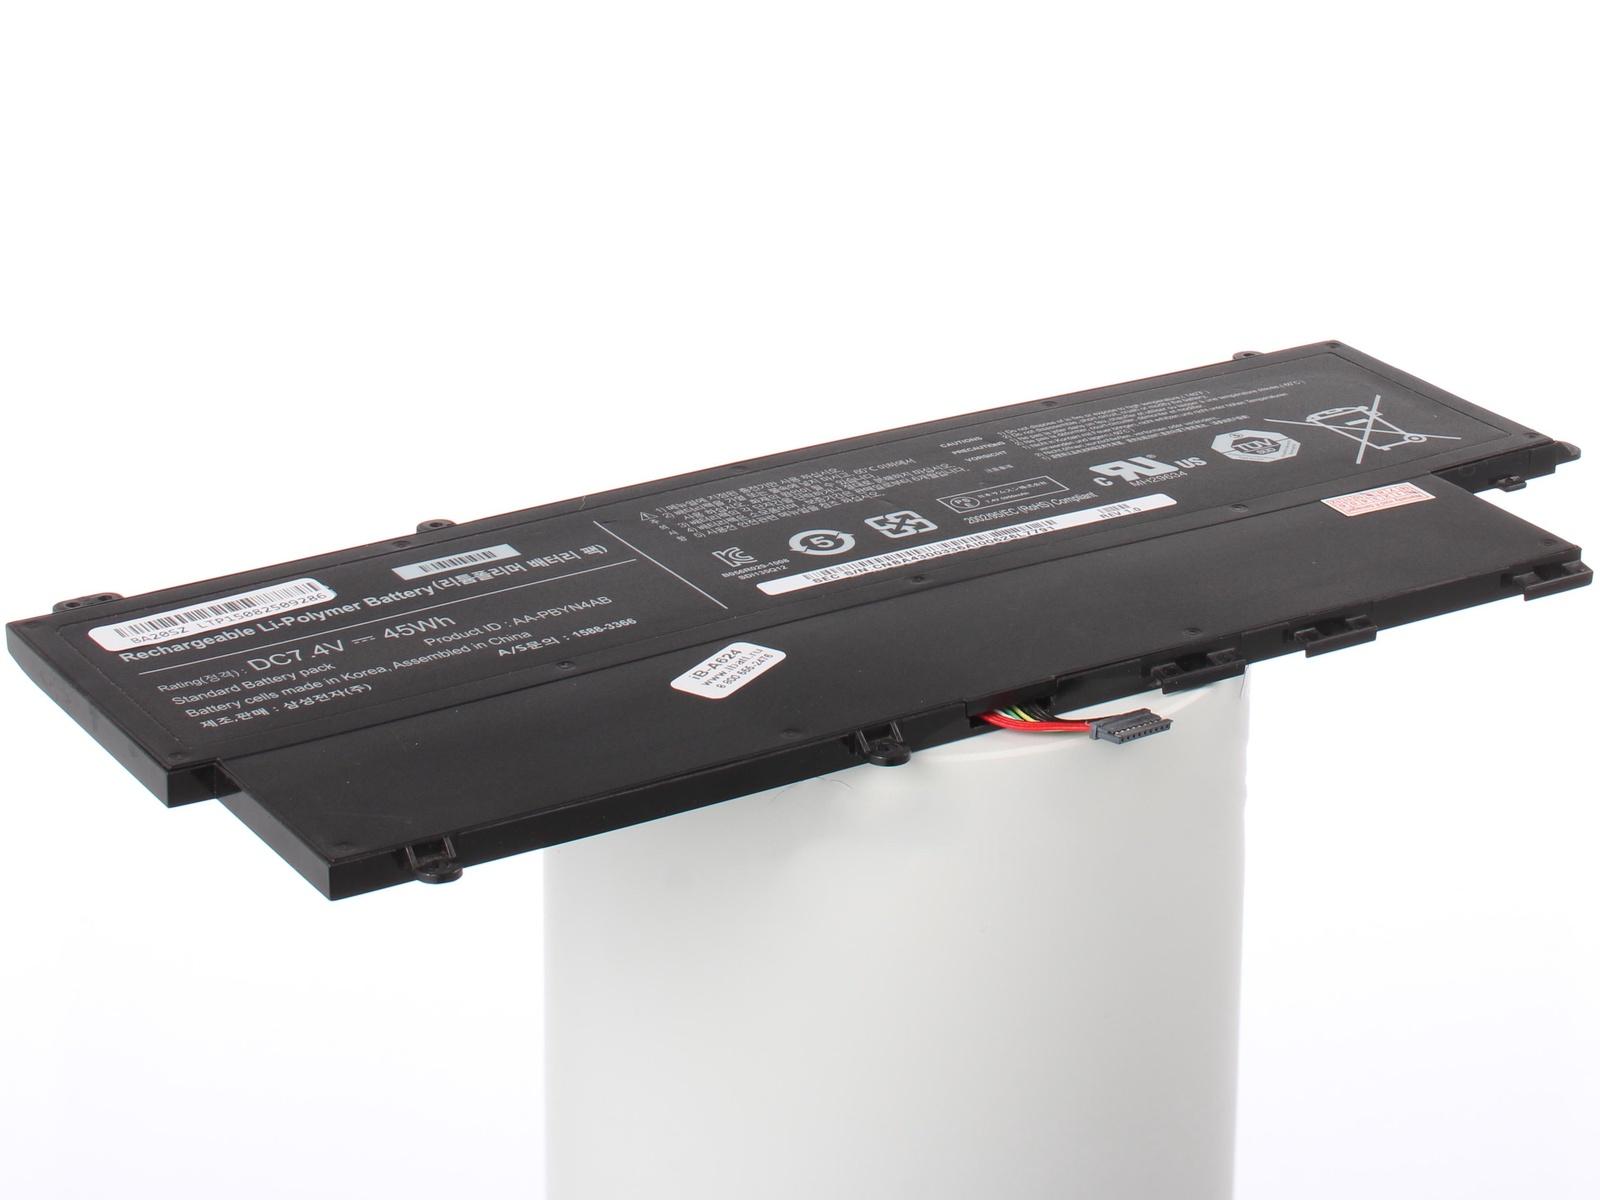 Аккумулятор для ноутбука iBatt для Samsung NP530U3C, NP530U3B, NP535U3C, 535U3C, 530U3B, 530U3C, Samsung 530U3B, Samsung 530U3C, 535U3C-A04, 535U3C-A06, 530U3B-A04, 530U3B-A02, 535U3C-A05, 530U3B-A01, 530U3C-A06, 530U3C-A01